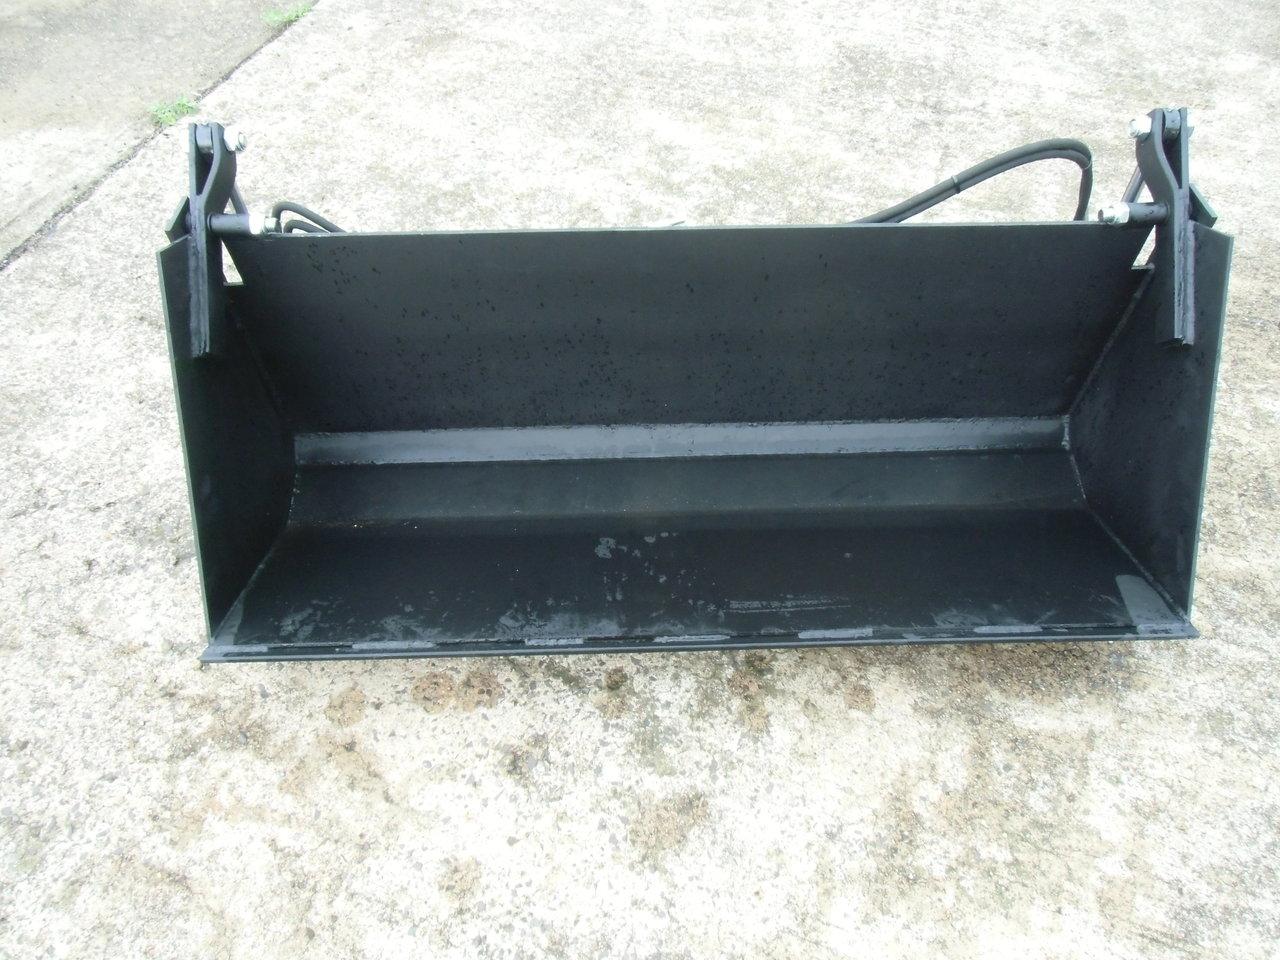 Berühmt Klappschaufel ideal für Kleintraktoren Kubota, Iseki, Yanmar #DL_68